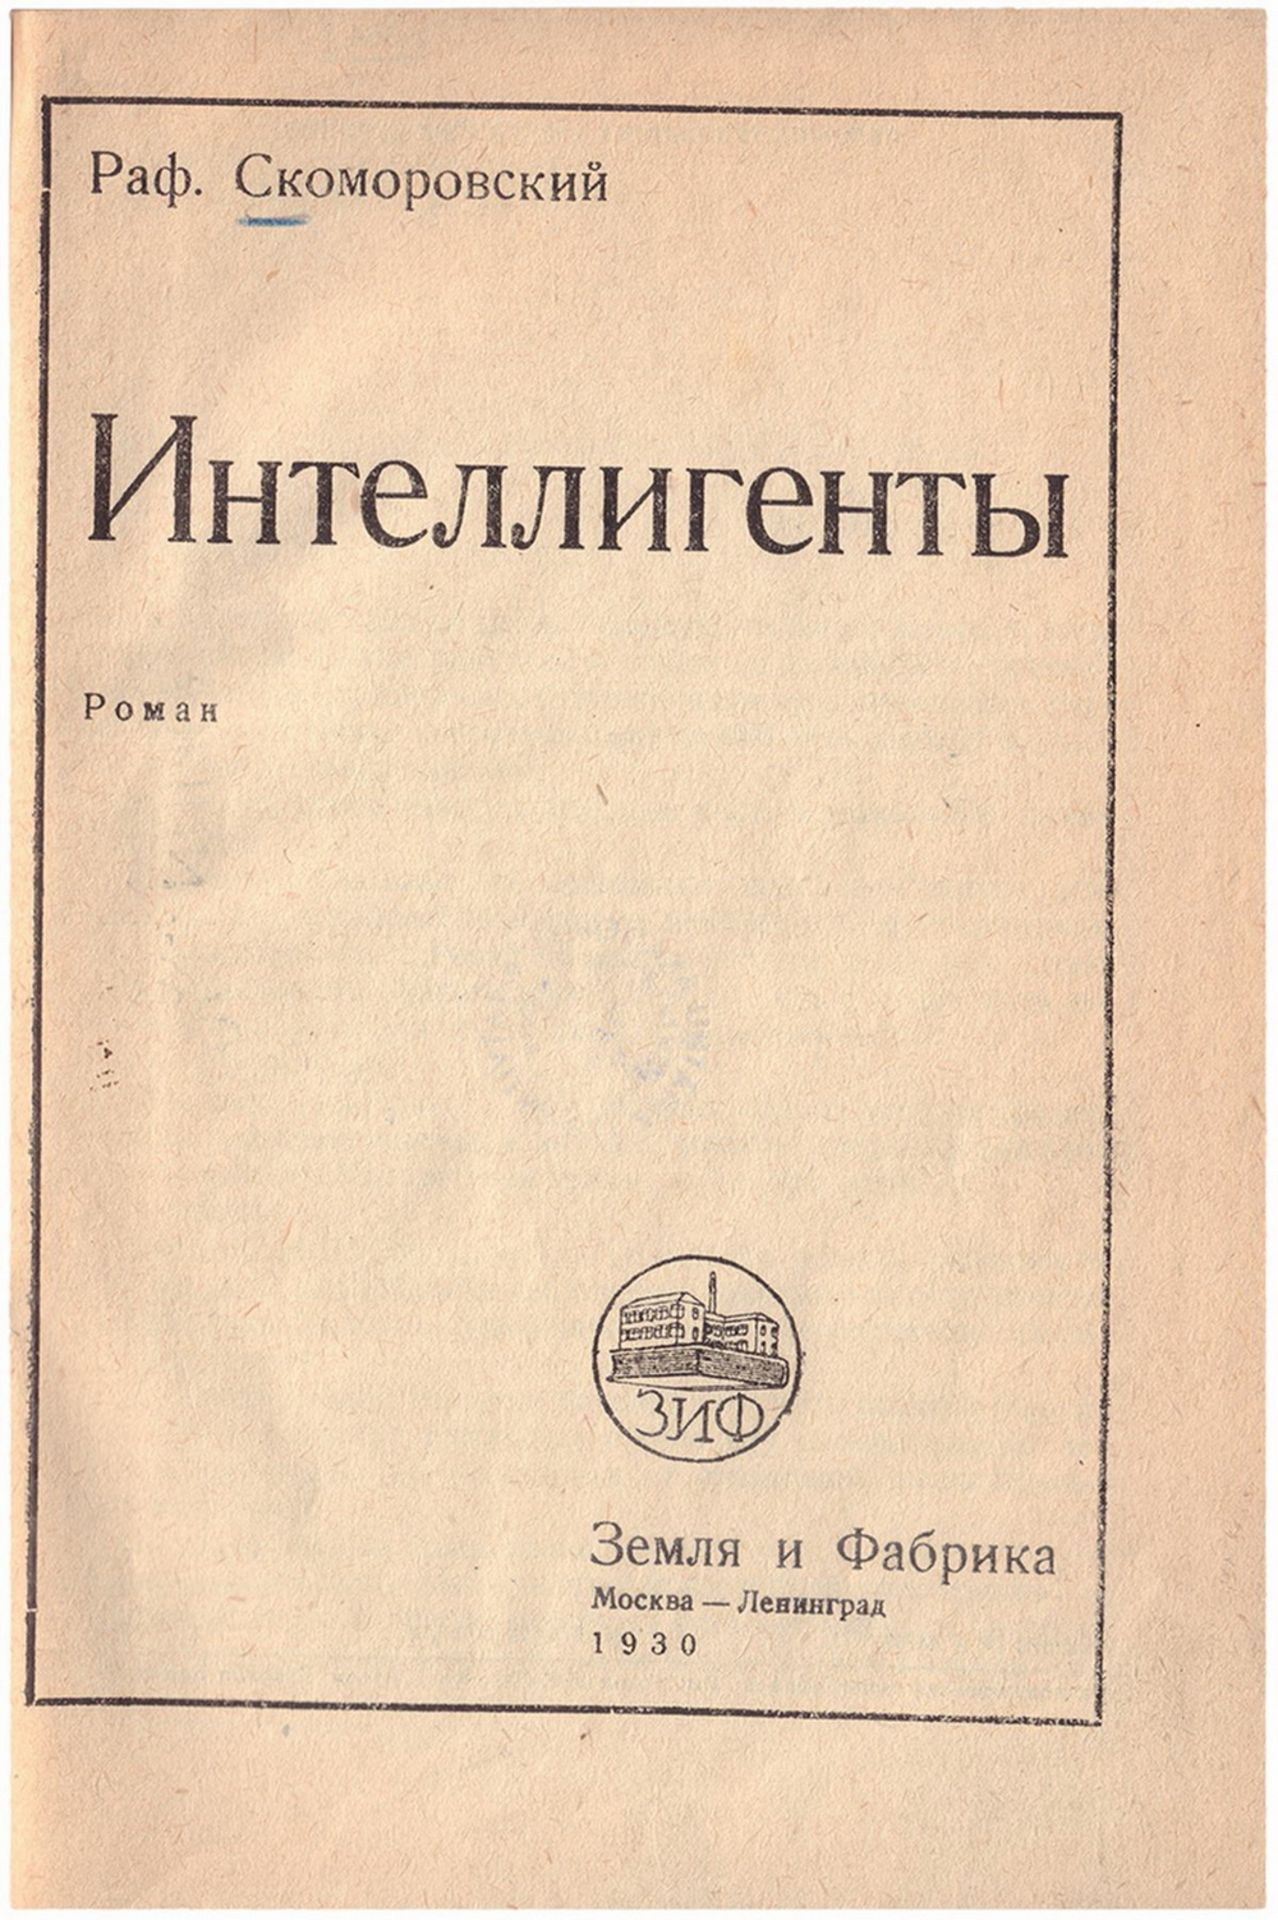 [Surikov, A., design. Soviet art]. Skomorovsky, R.S. Intellectuals: a Novel. - Moscow; Leningrad, 19 - Bild 2 aus 2